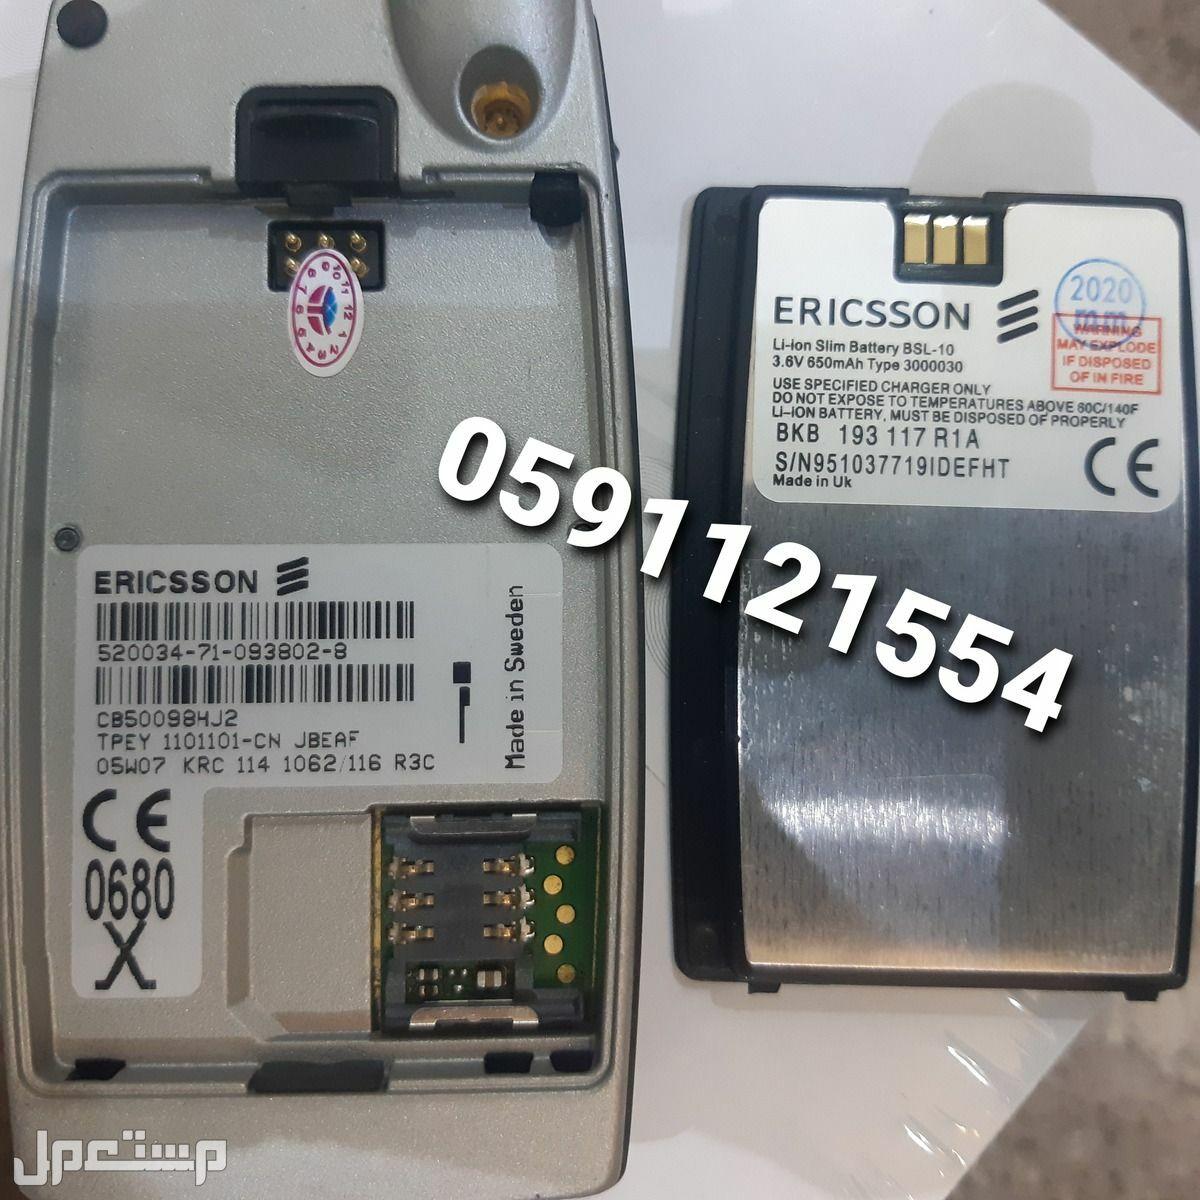 جوال اريكسون القديم Ericsson T28s قلاب - جديد